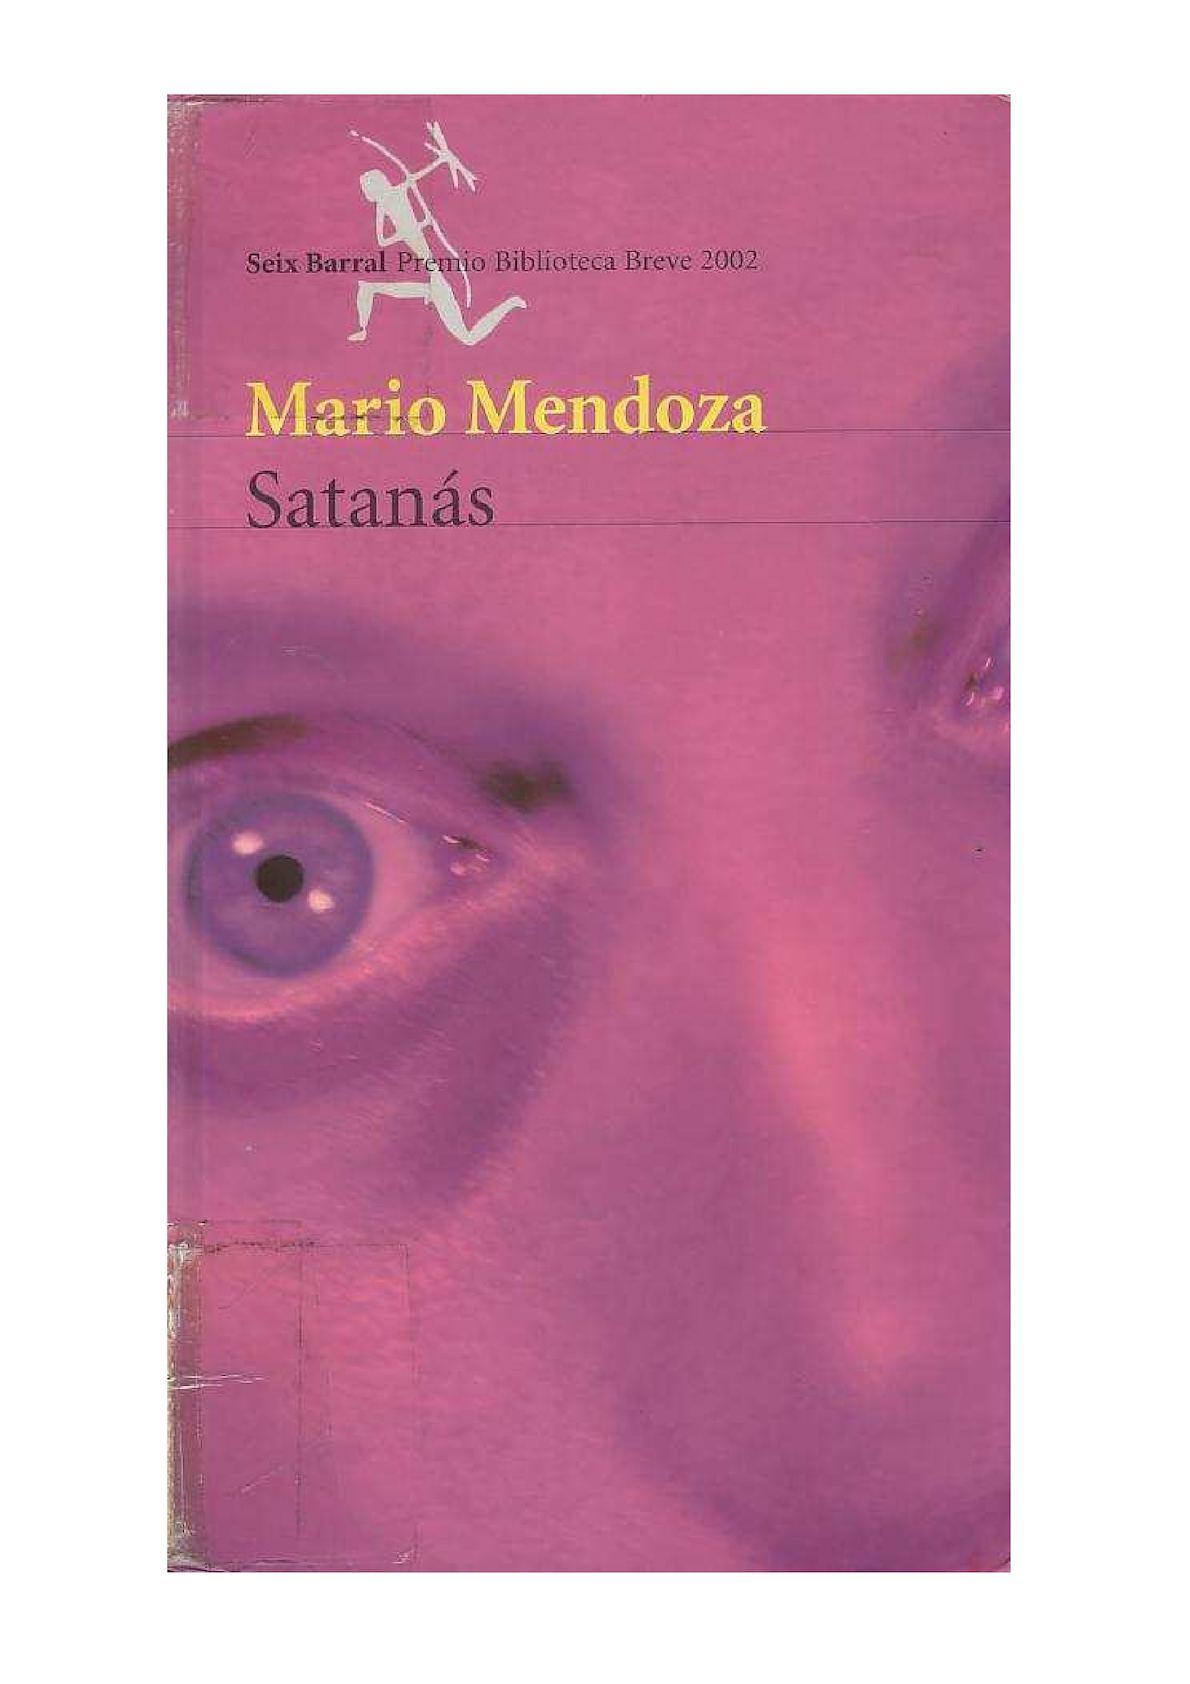 Calaméo - Mendoza Mario - Satanas